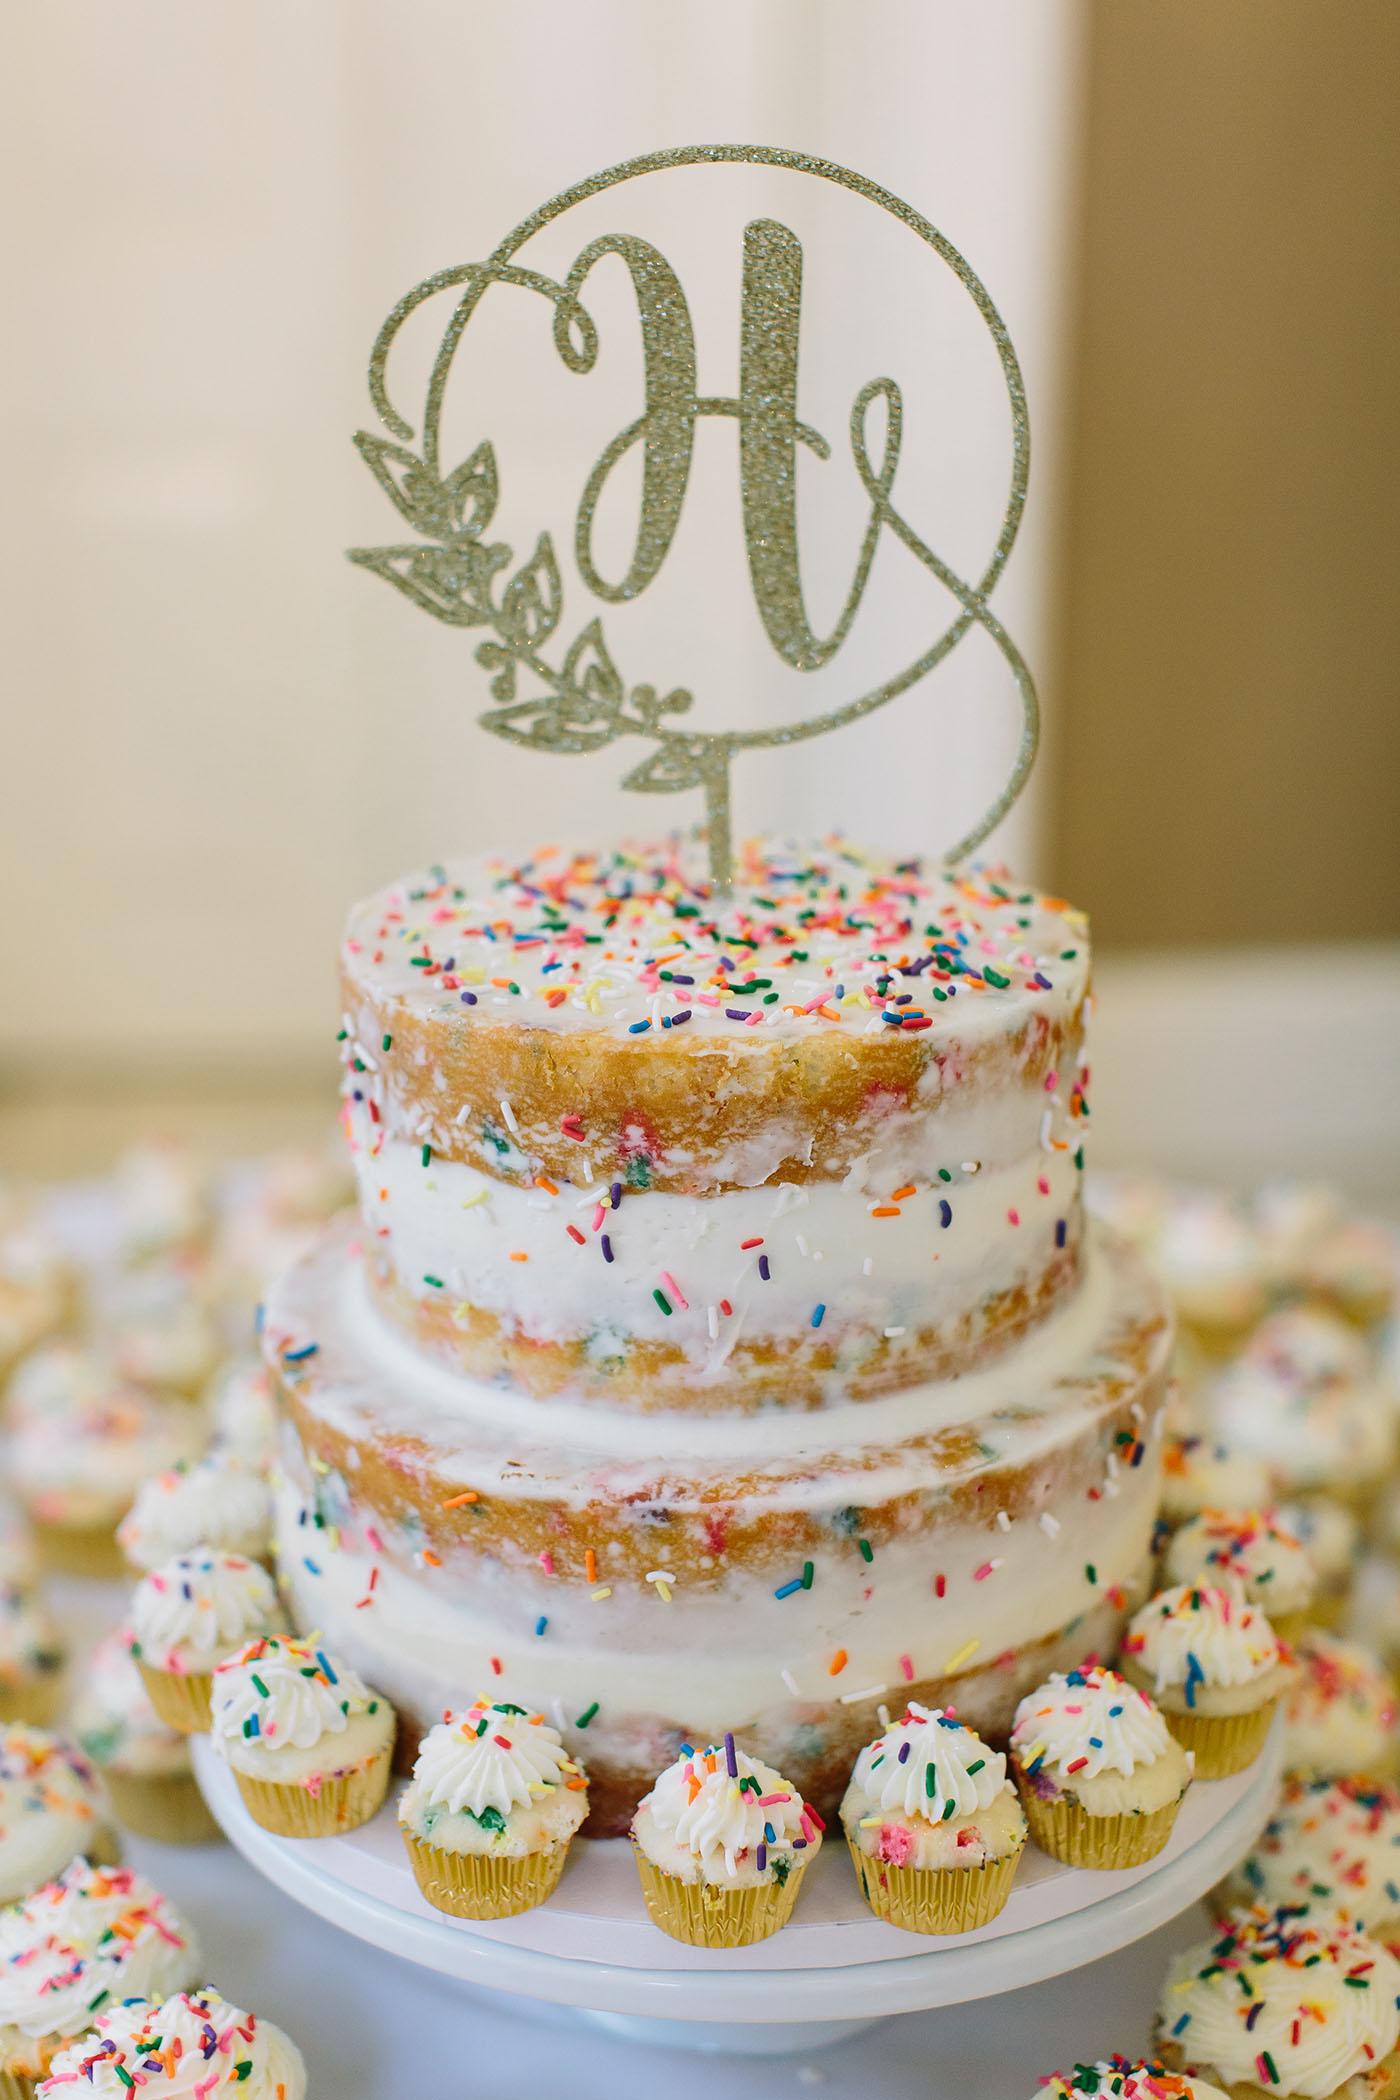 Tiered Funfetti Cake